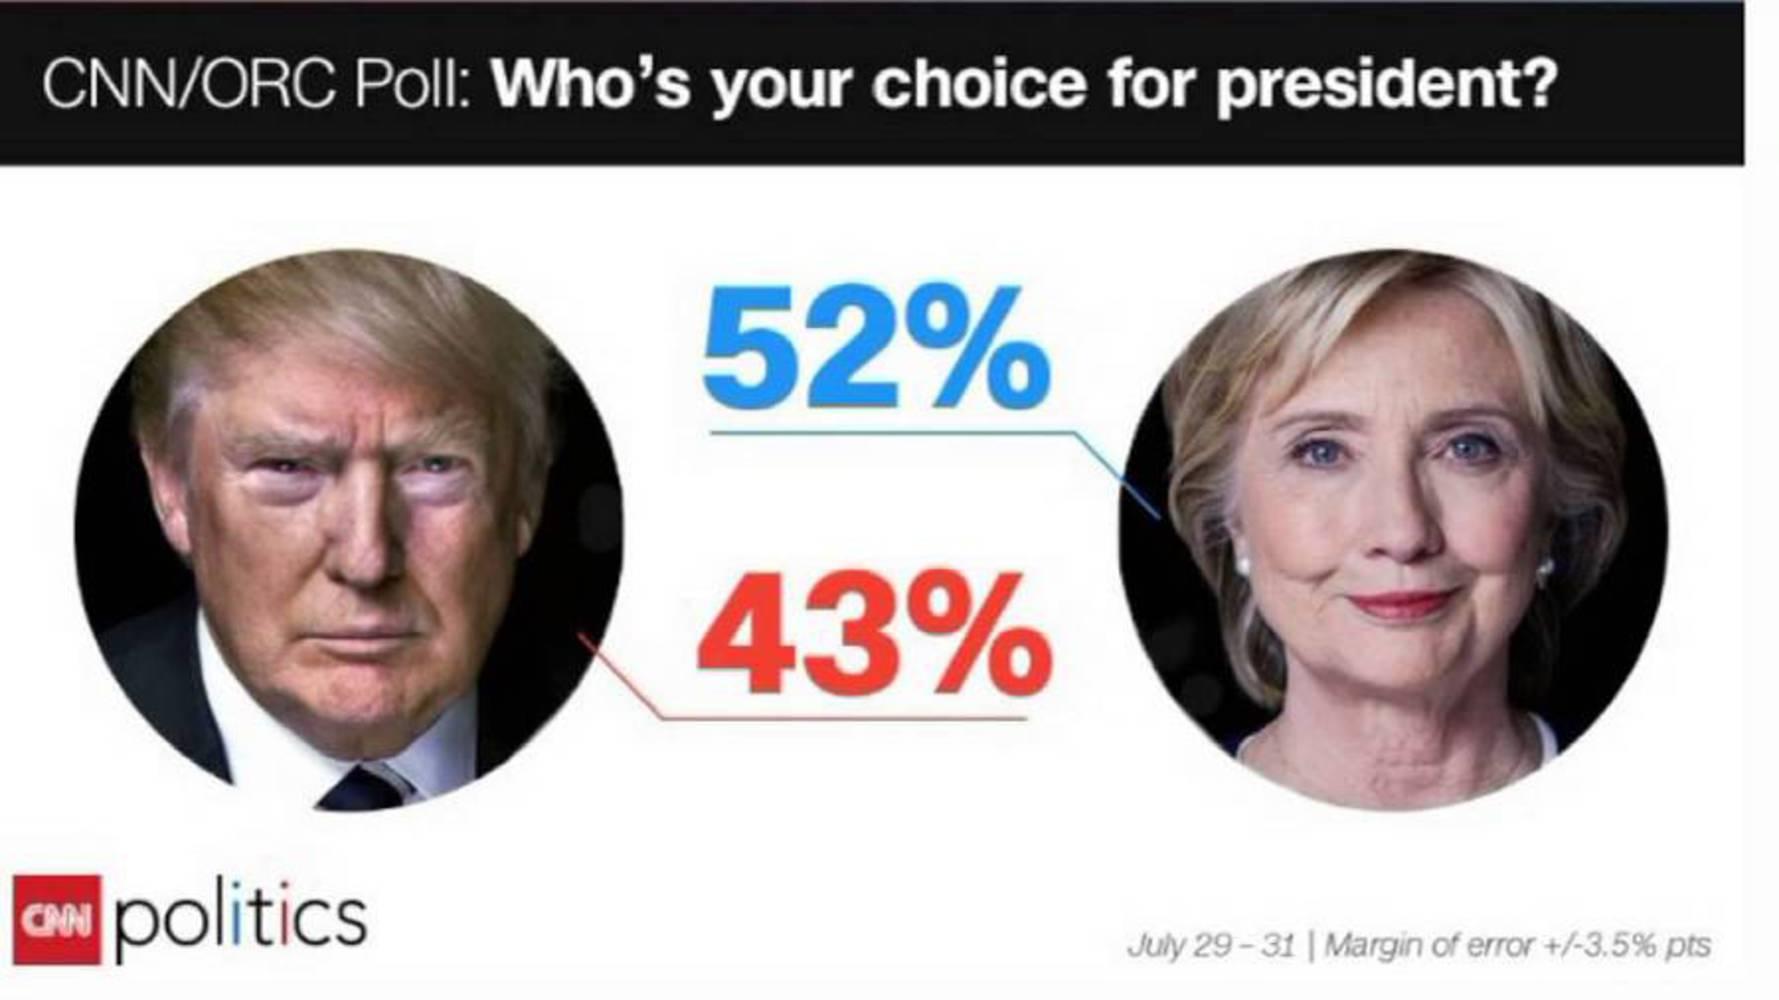 Maxresdefault %281%29.thumb